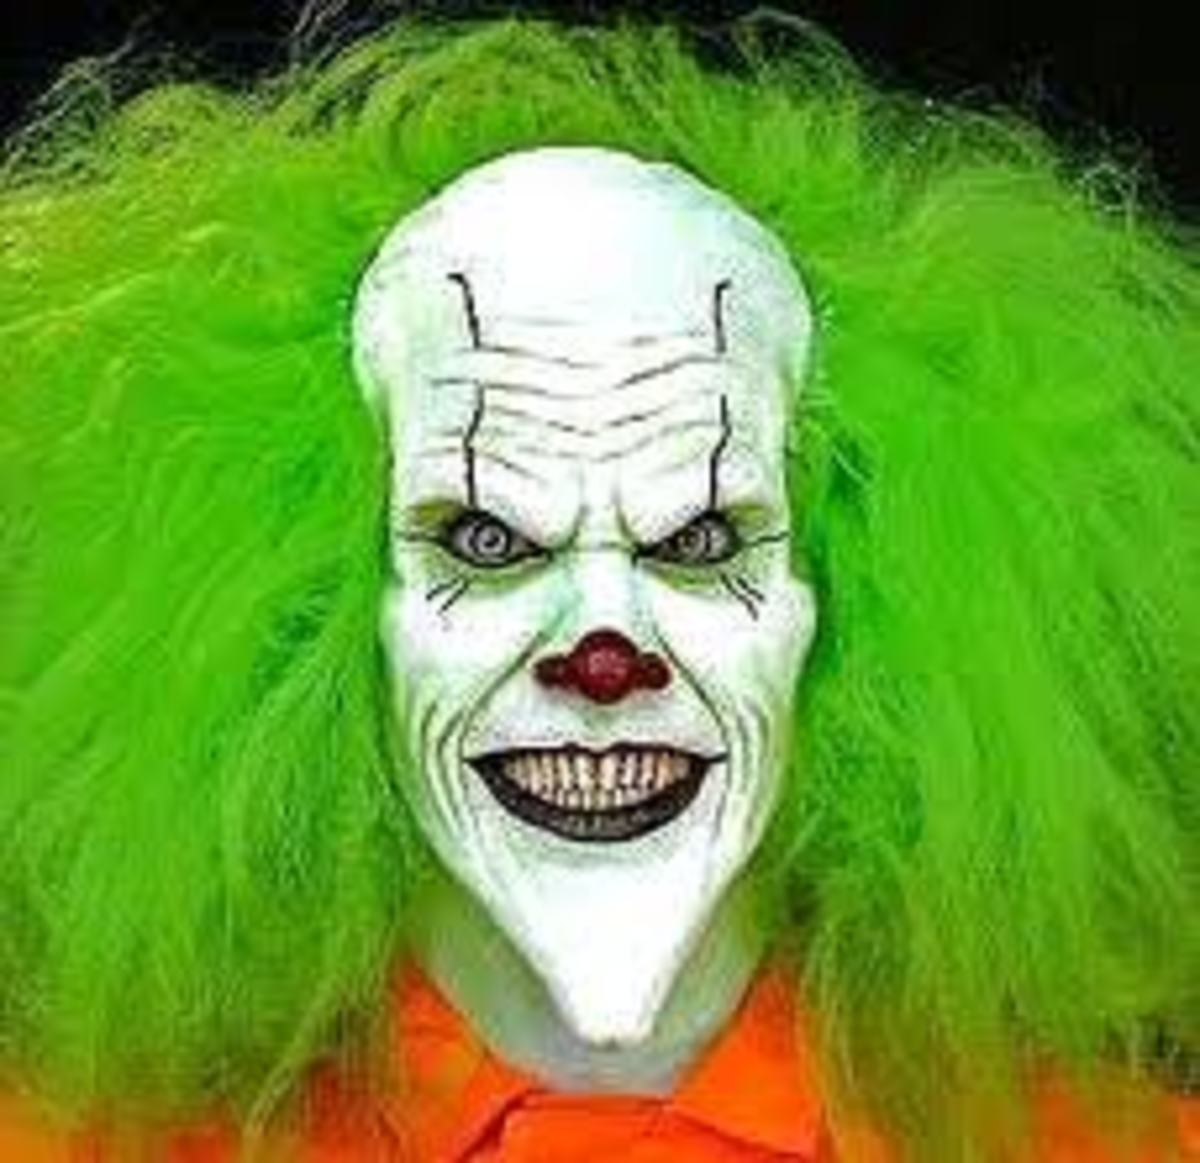 Midget Clown Urban Legend 86